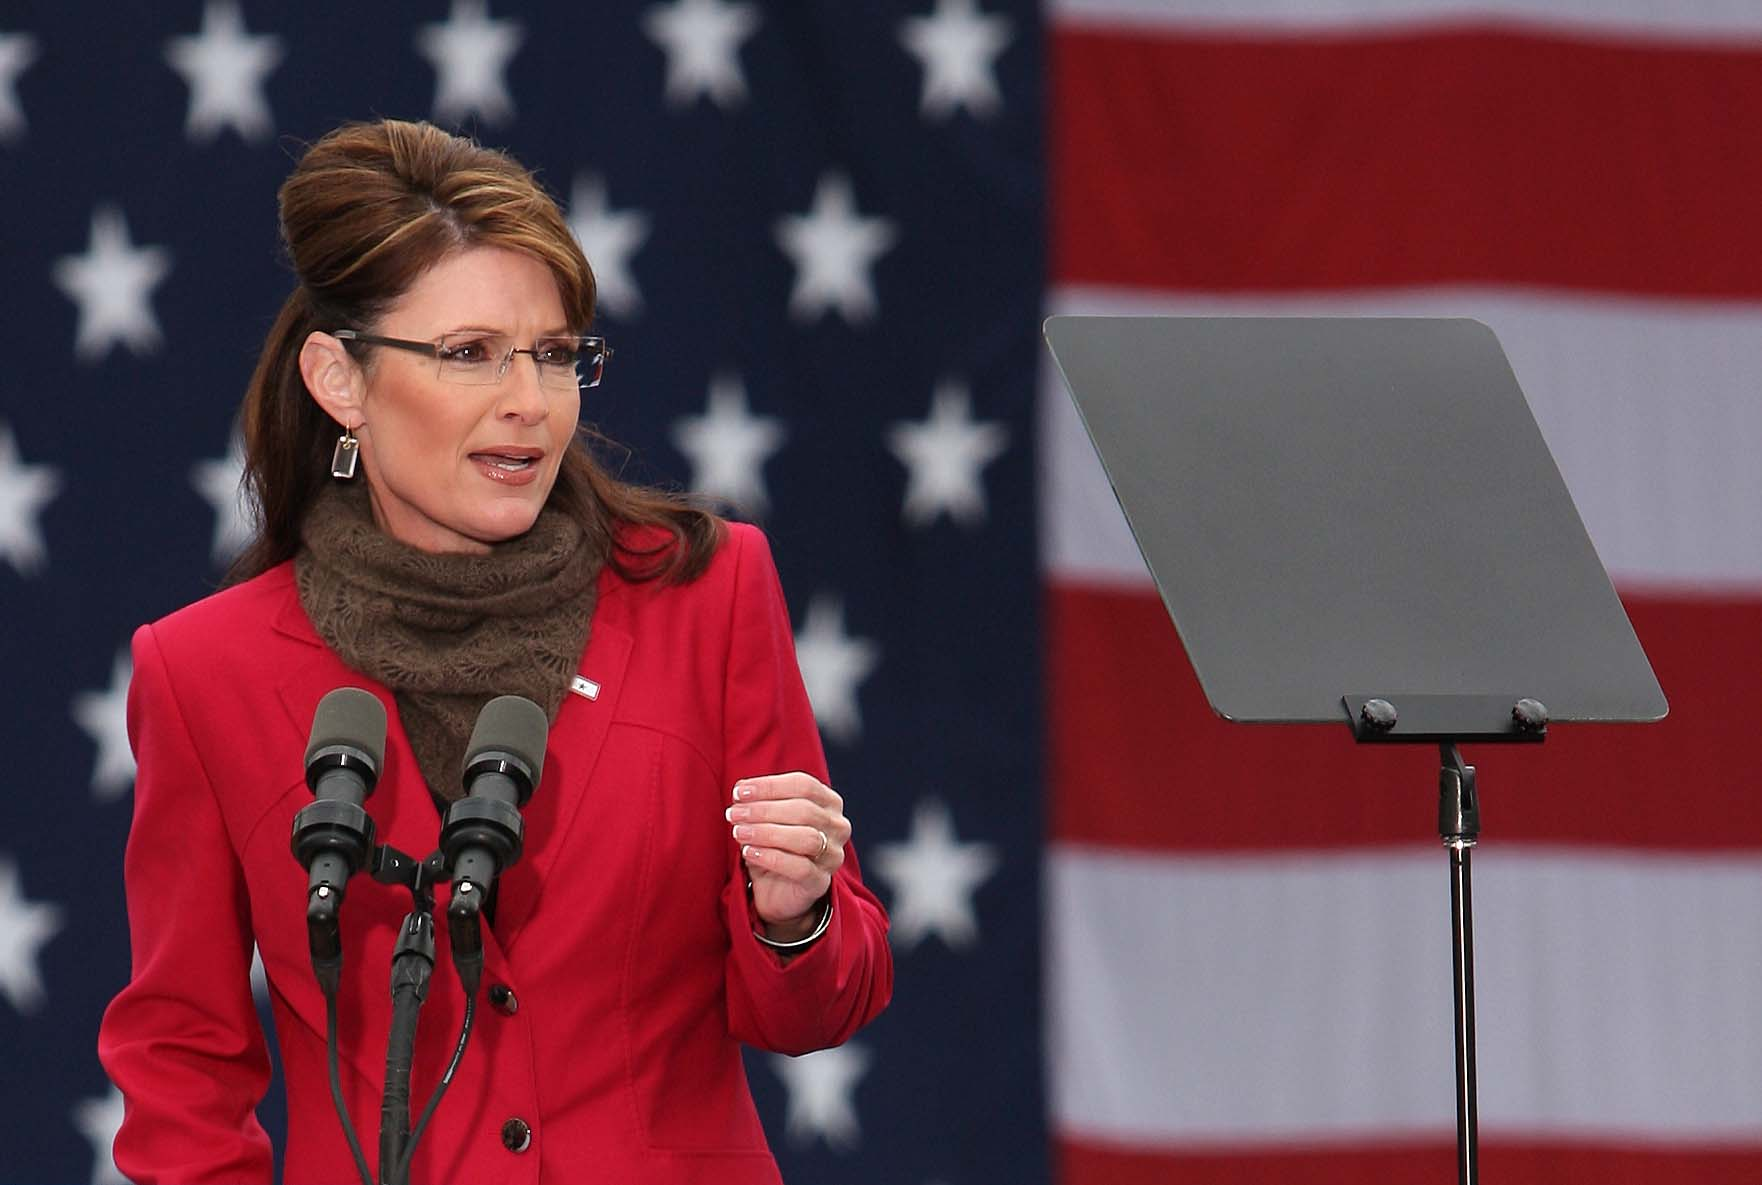 Vice Presidential Candidate - Gov. Sarah Palin - 2008